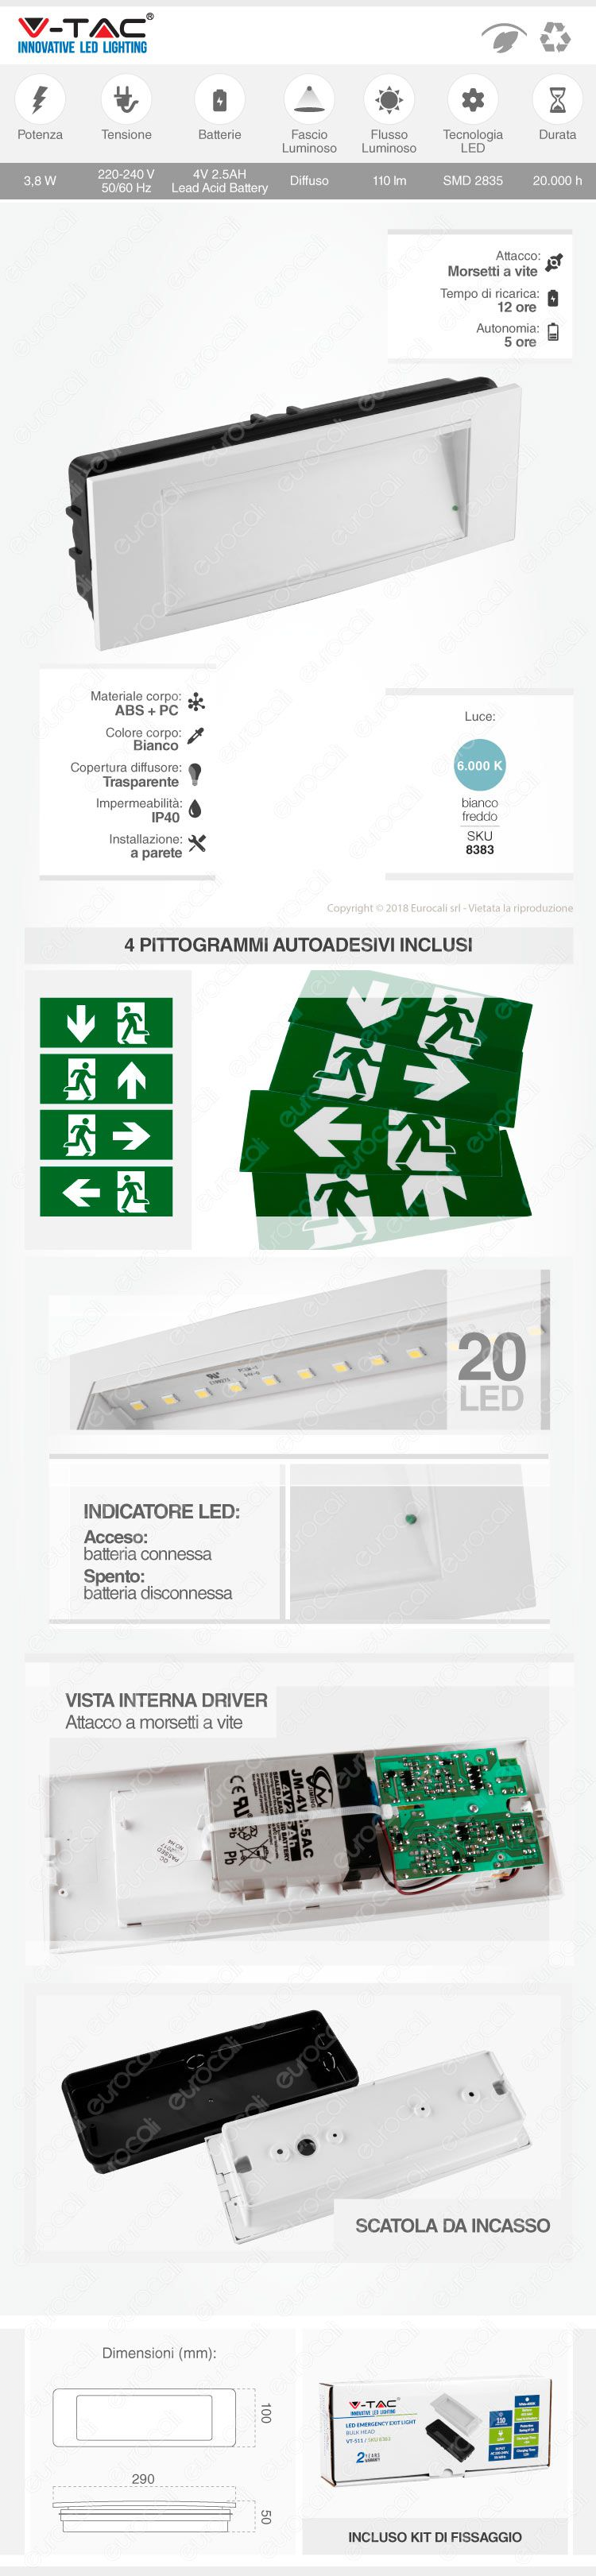 v-tac lampada d'emergenza 110lm